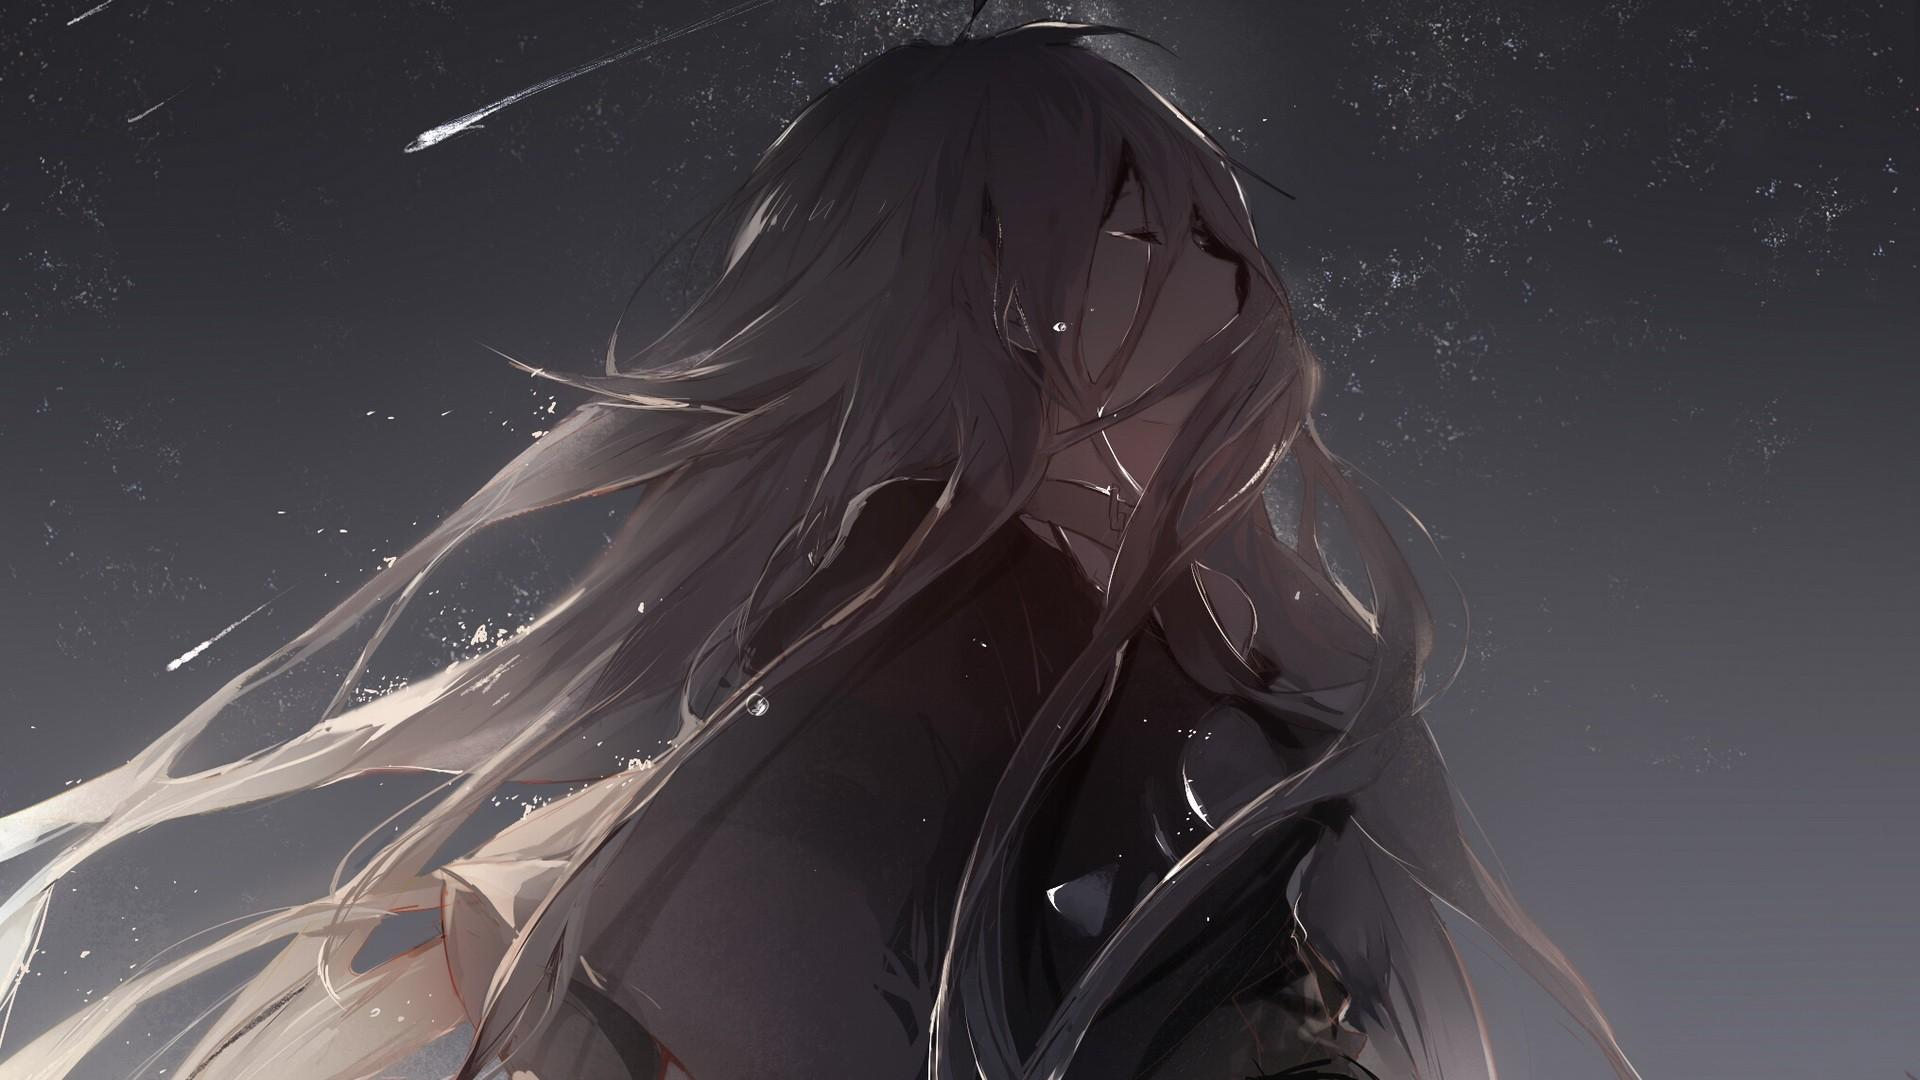 11+ Rain Sad Anime Wallpaper 4K Images